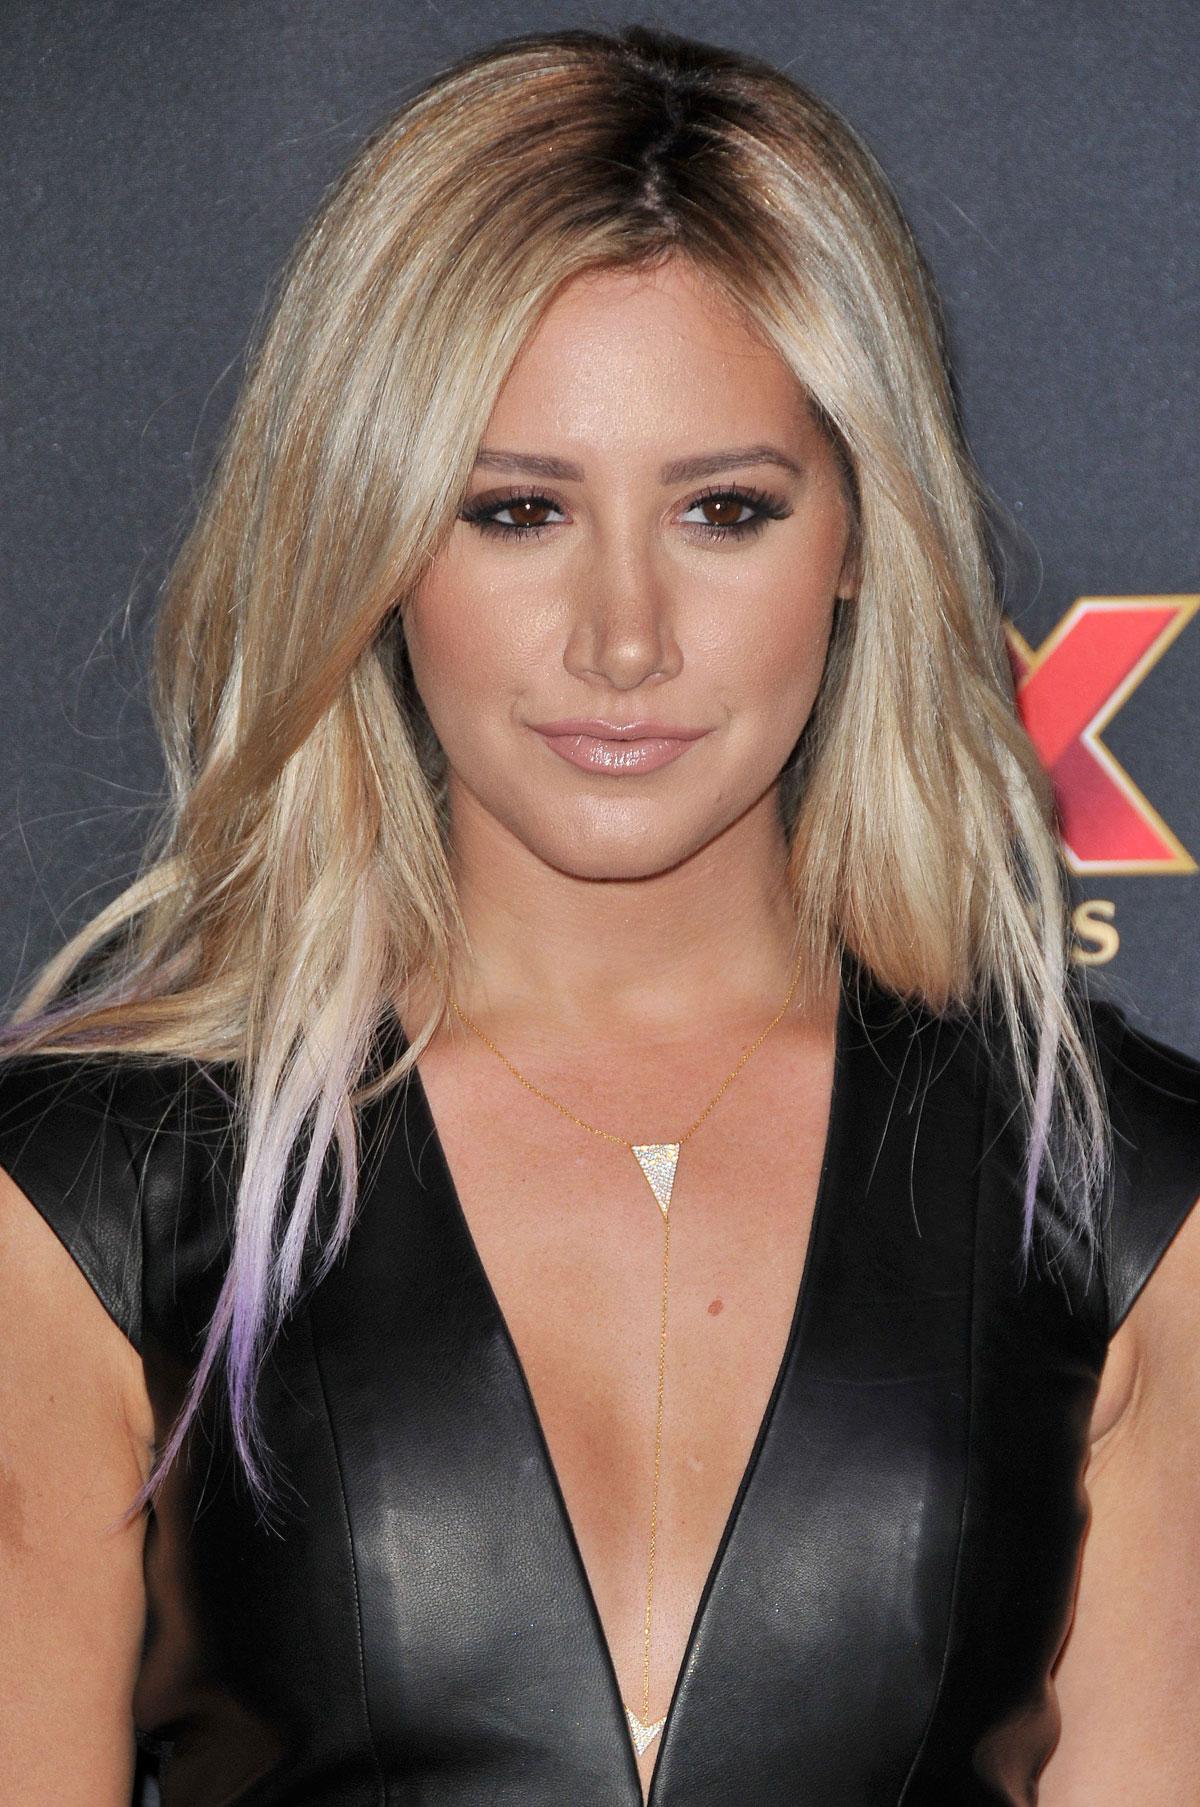 Ashley Tisdale attneds The Walking Dead season 5 premiere